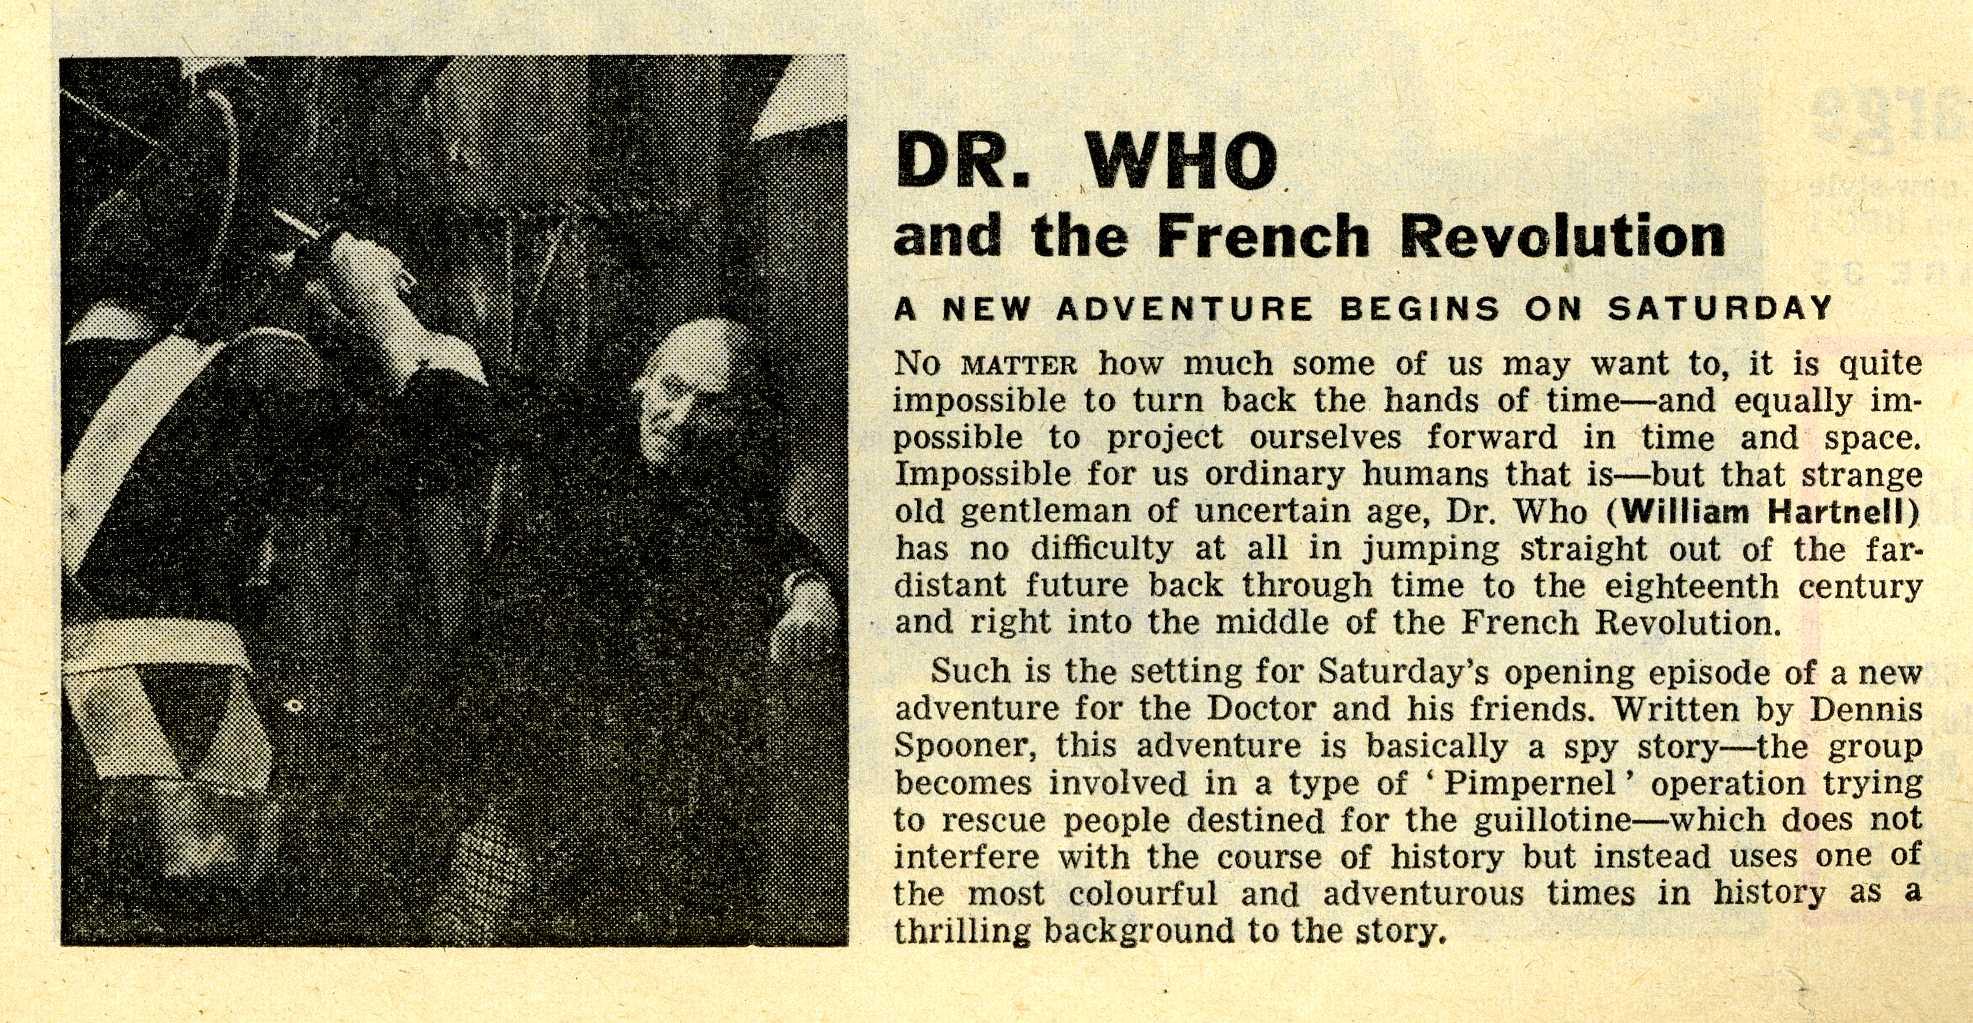 Radio Times. The Massacre of St. Bartholomew's Eve article, 8-14 August 1964